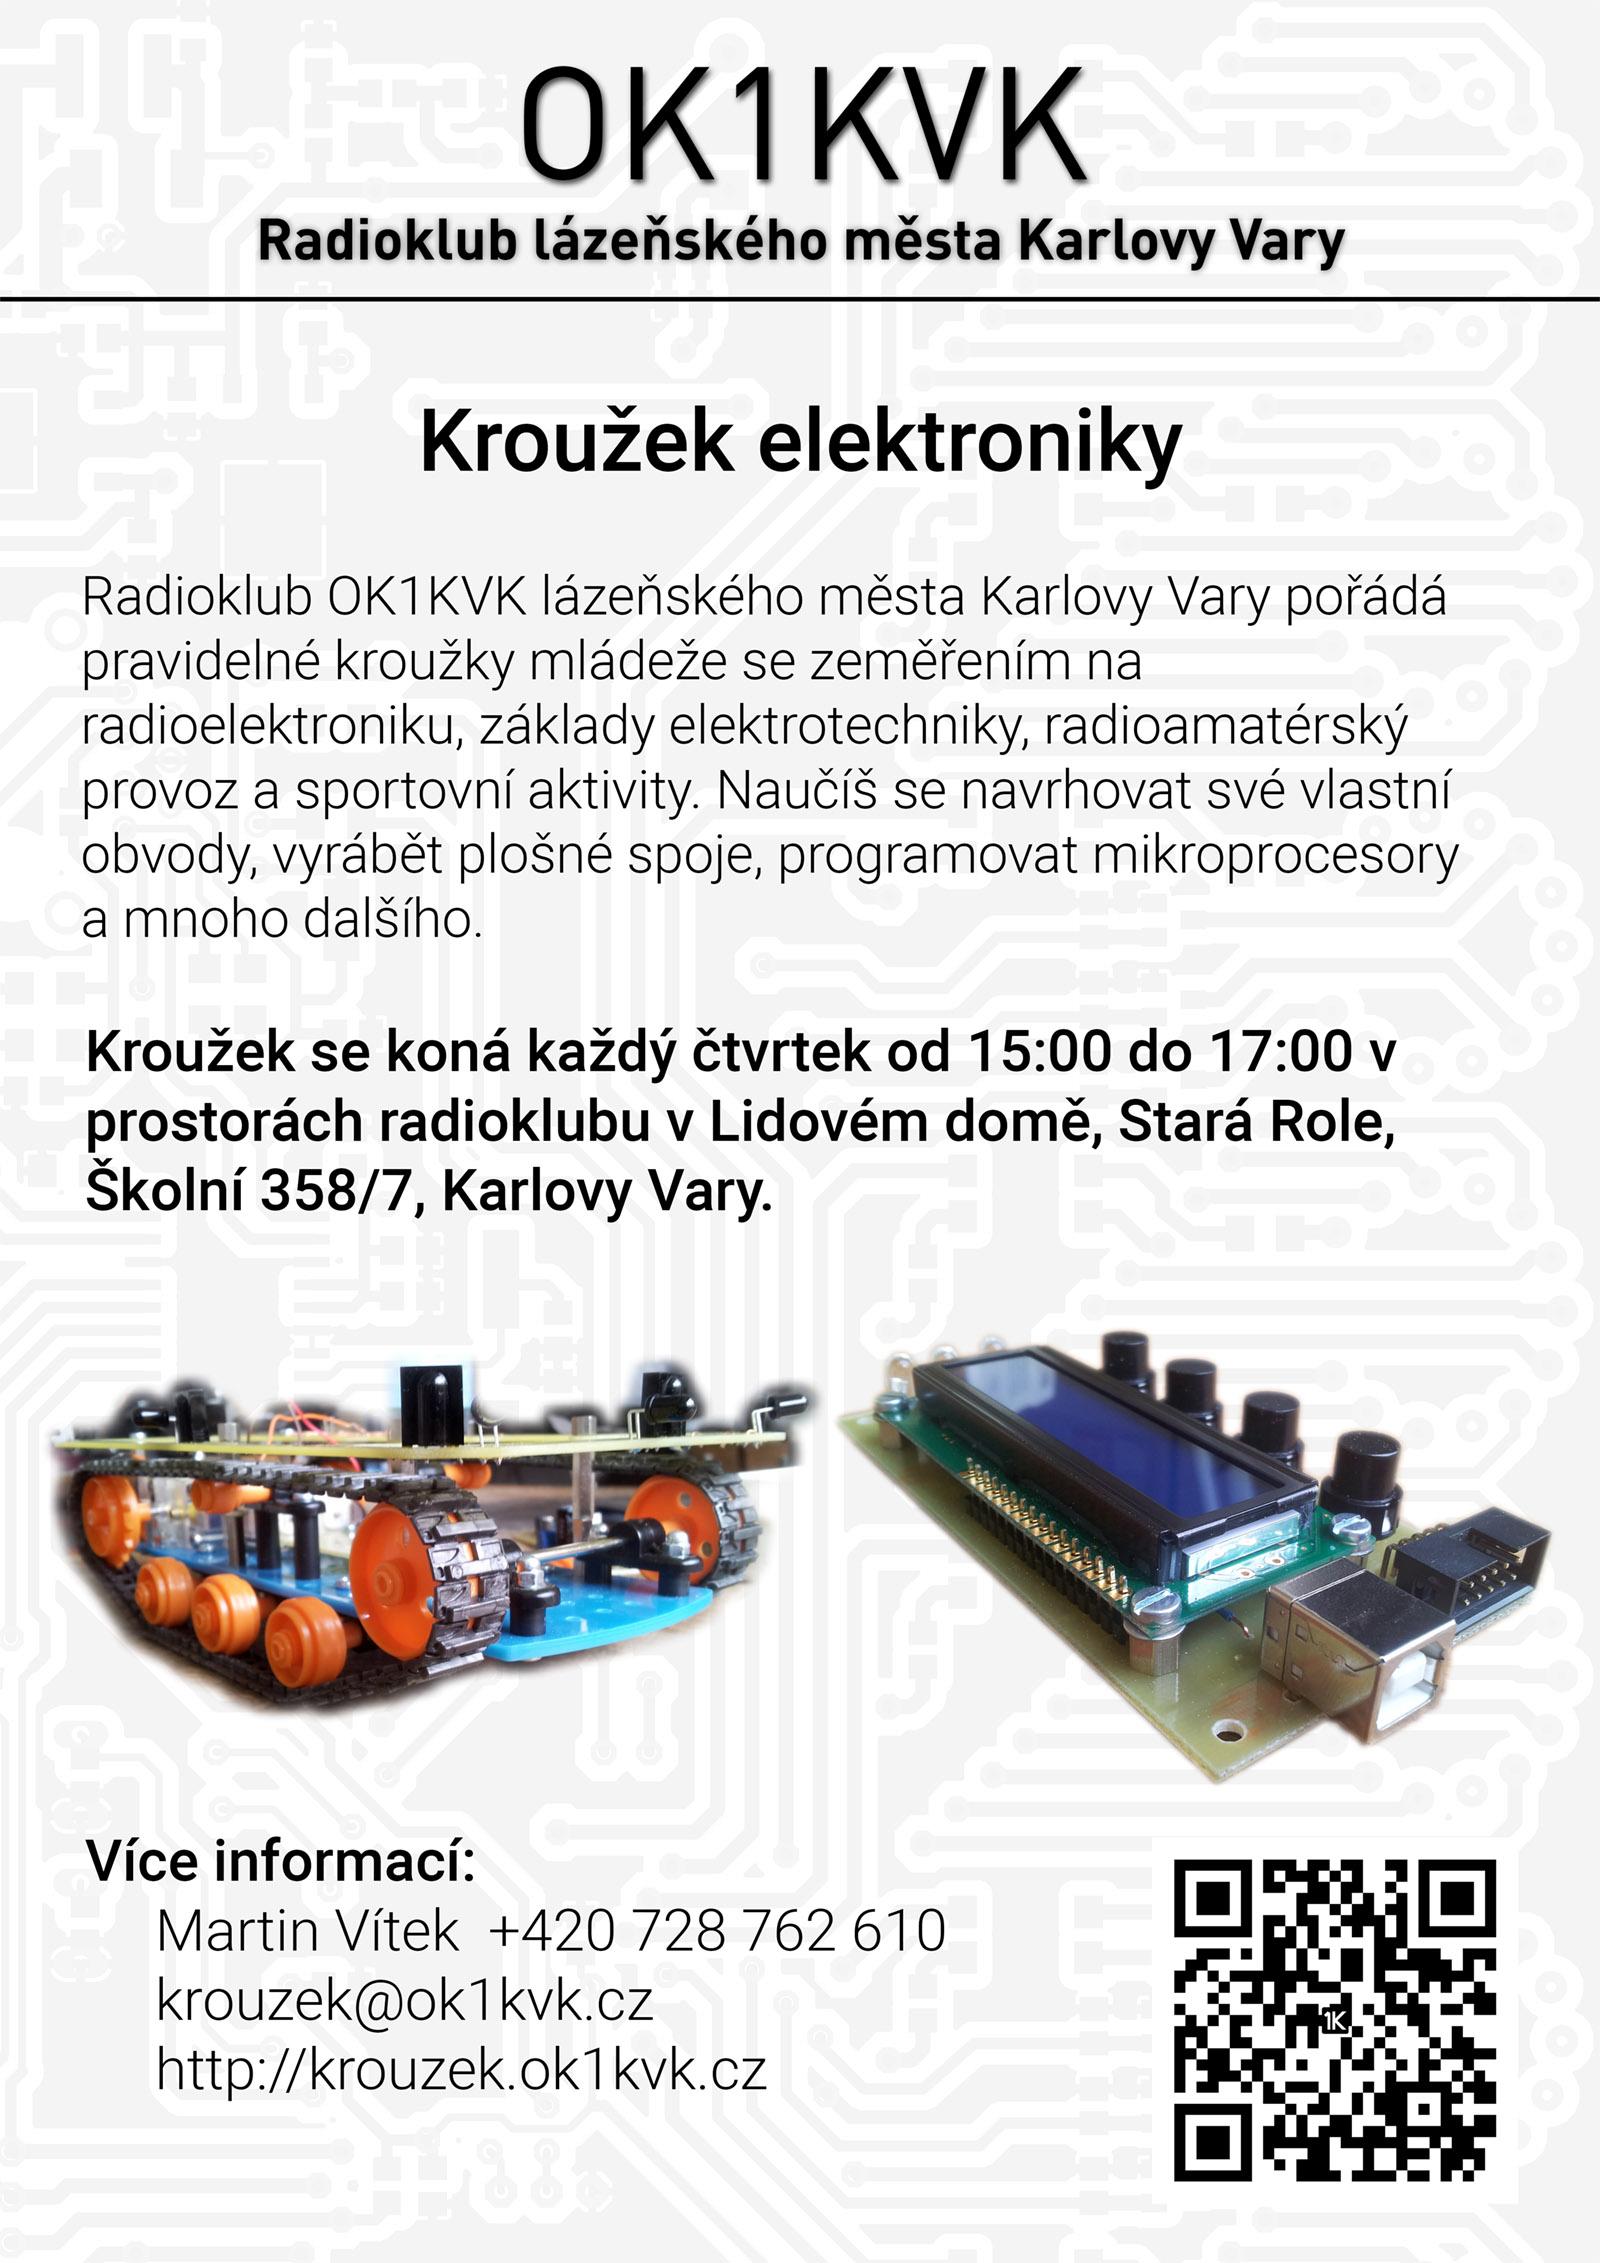 articles/2018/krouzek-2018-2019/ok1kvk_krouzek_web.jpg